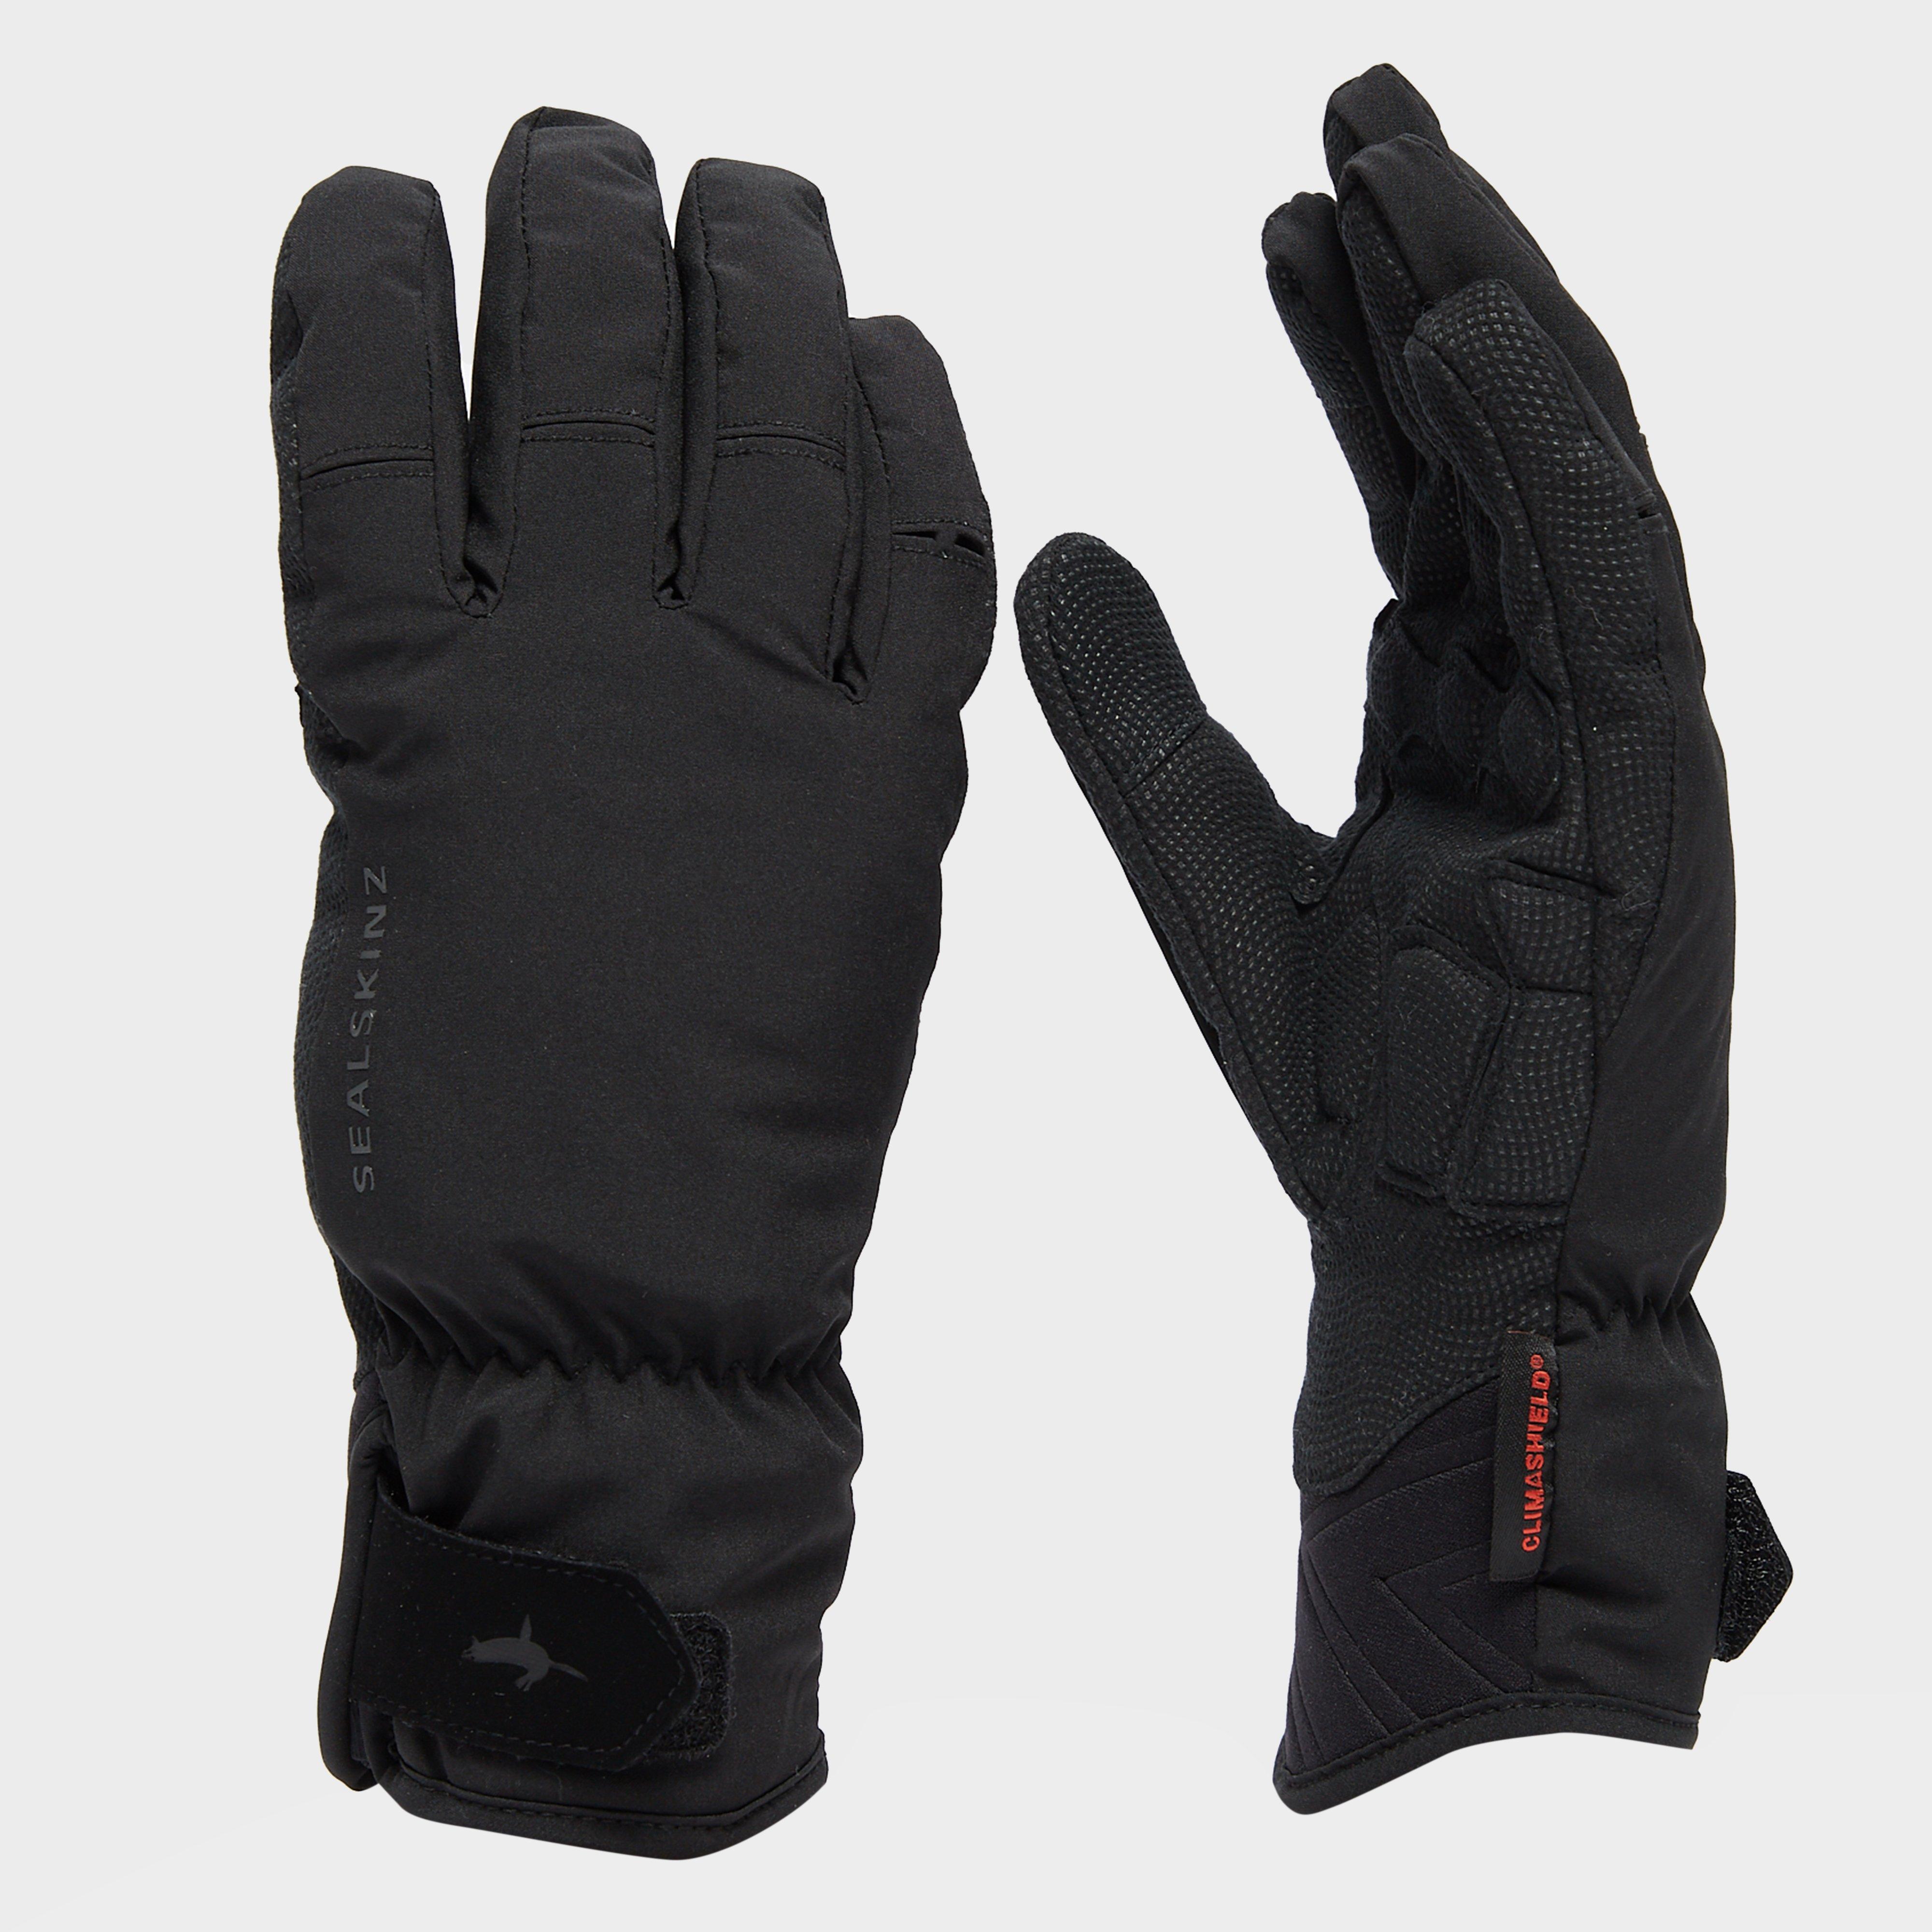 SealSkinz Sealskinz Highland Gloves